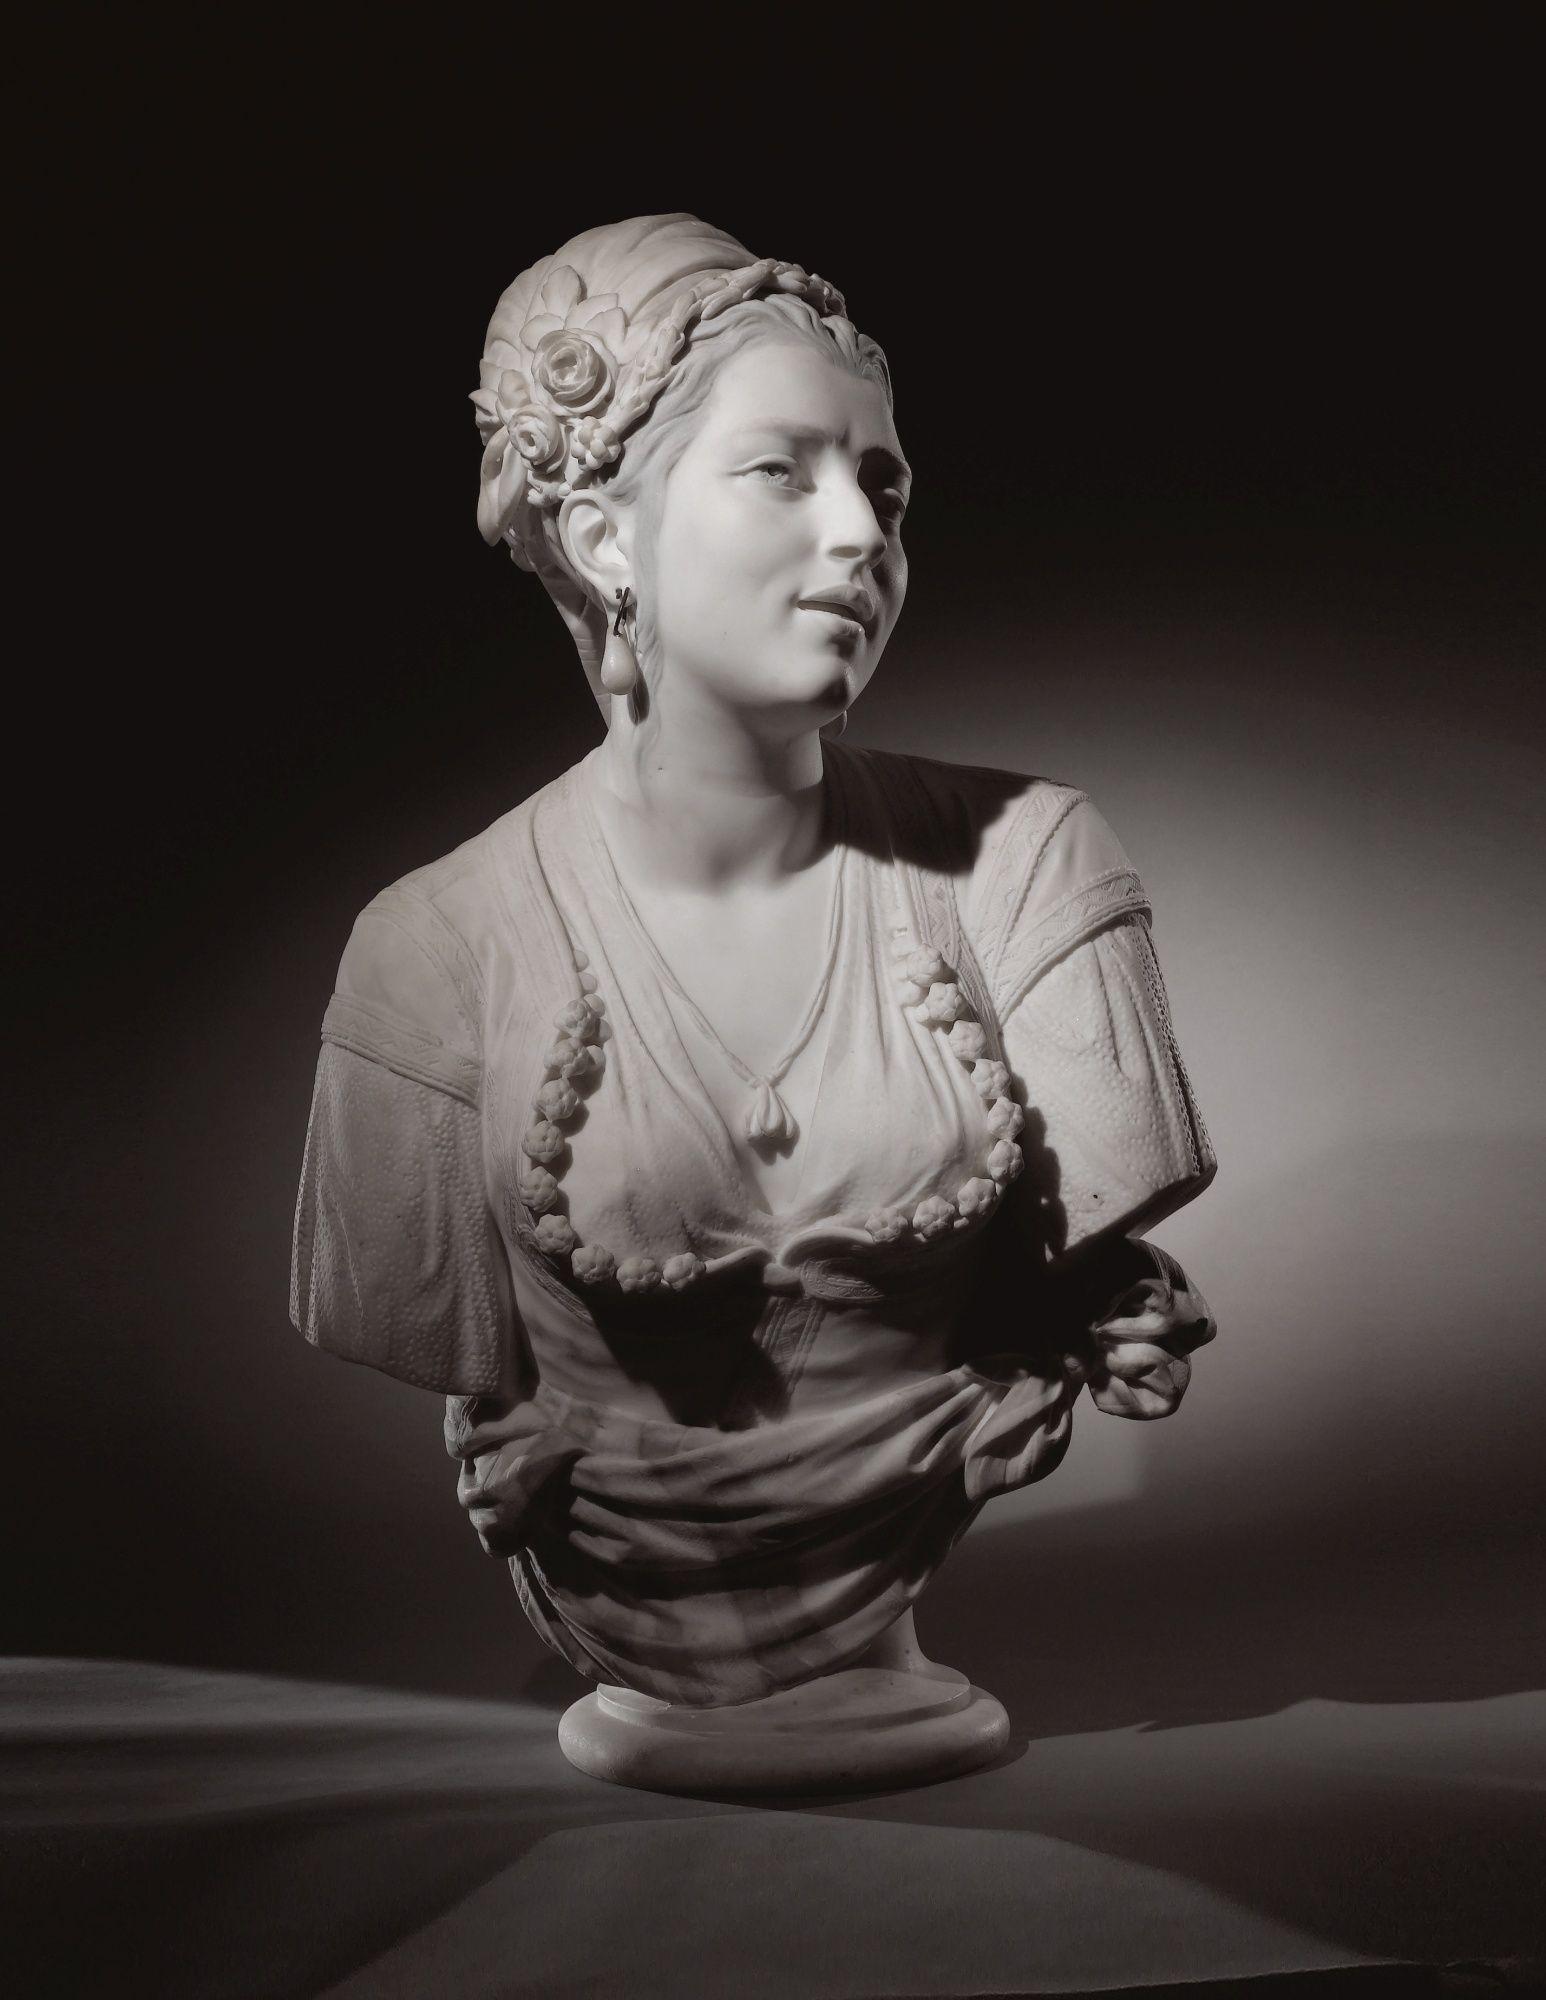 Charles-Henri-Joseph Cordier. FRENCH 1827 - 1905. MAURESQUE D'ALGER CHANTANT (MOORISH WOMAN OF ALGIERS SINGING)